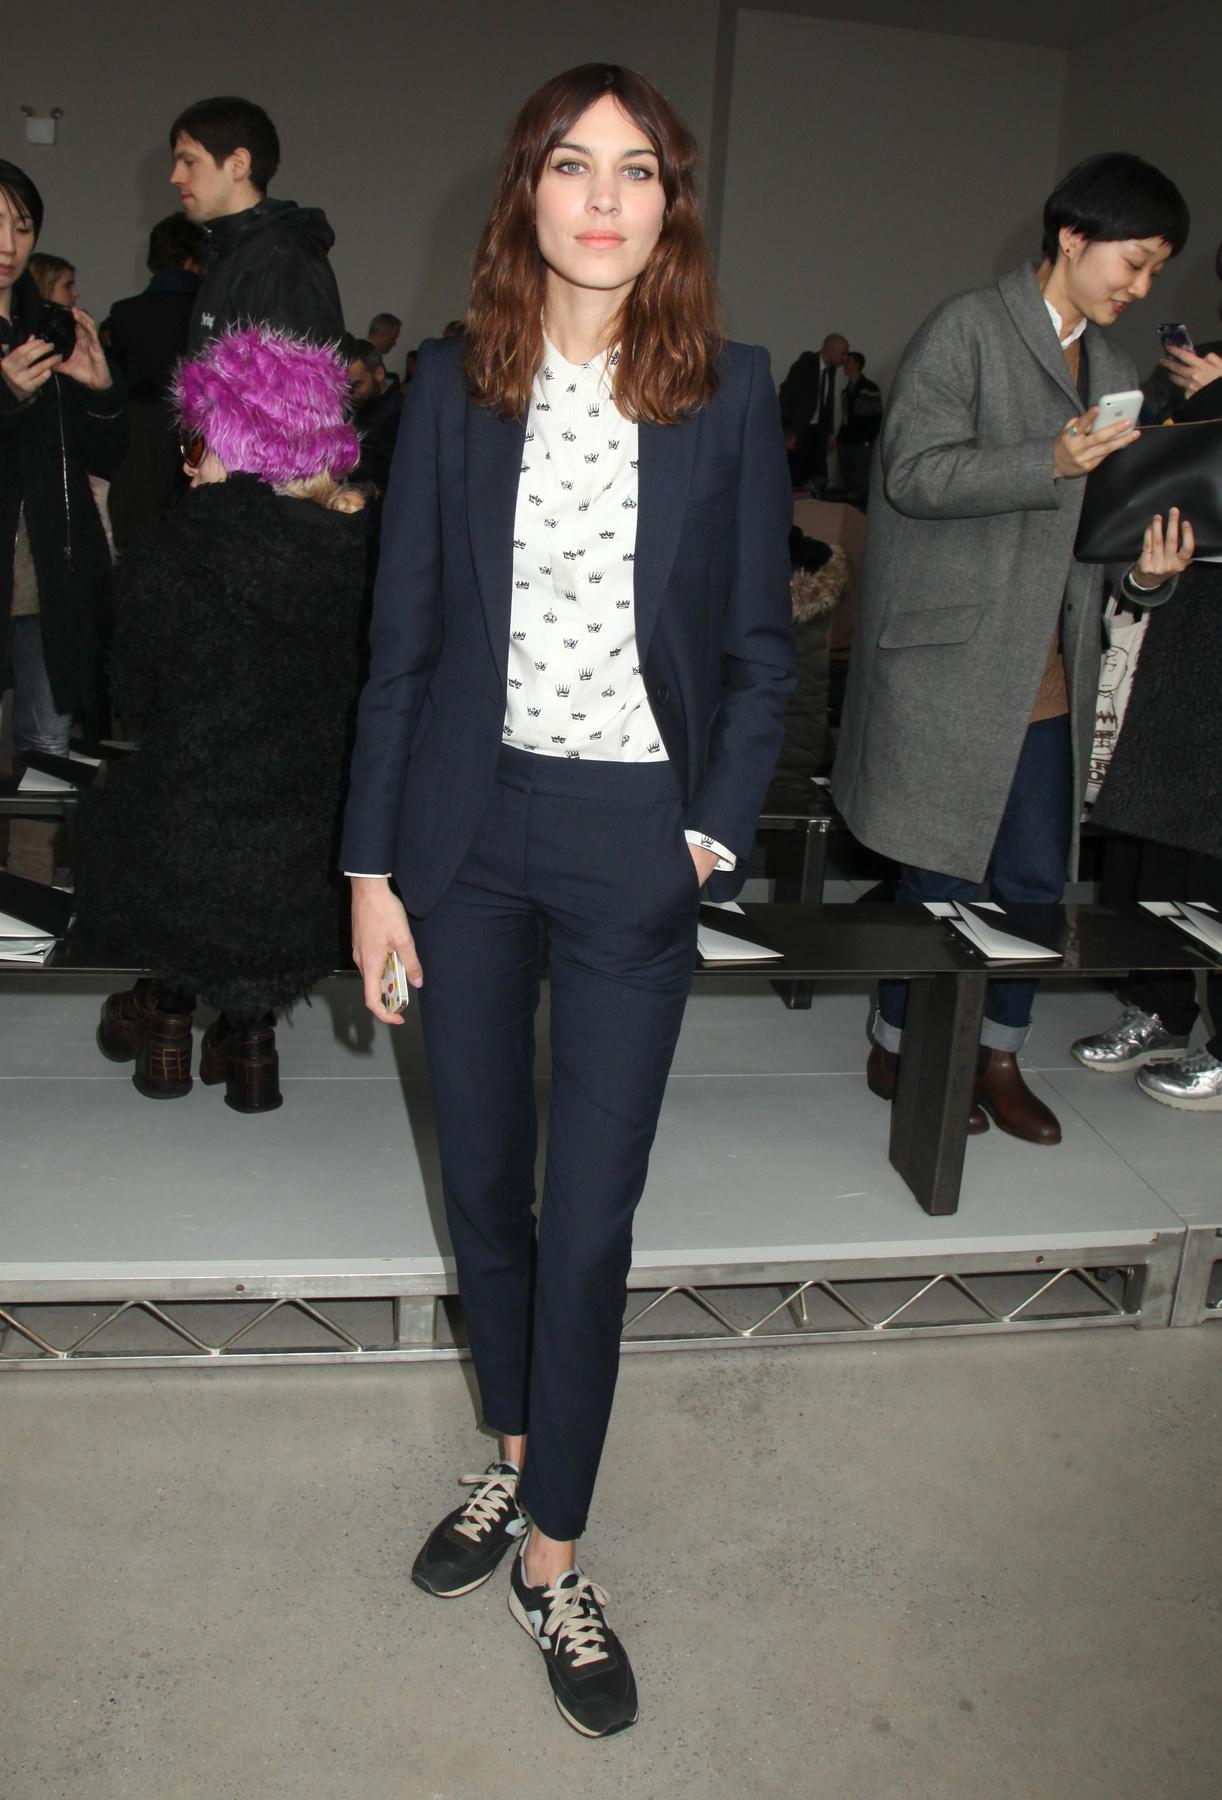 Calvin Klein show, Autumn Winter 2014 Mercedes-Benz Fashion Week, New York, America - 13 Feb 2014